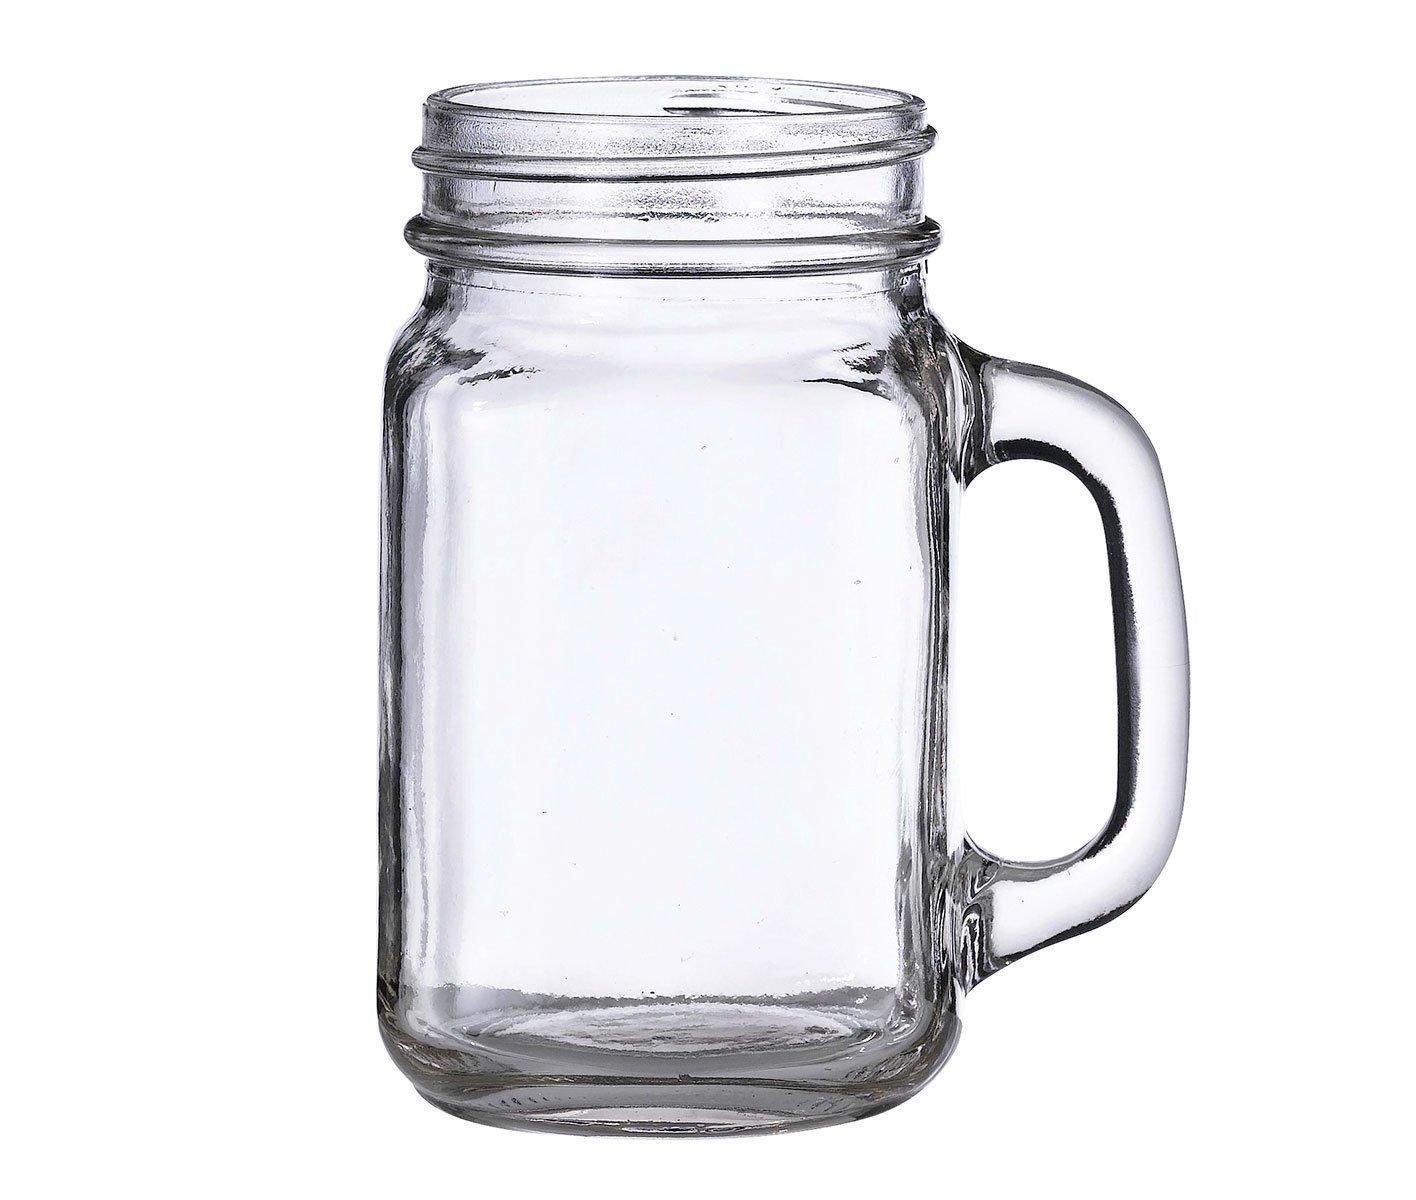 Lillian Rose Plain Rustic Country Mason Jar Mug G121